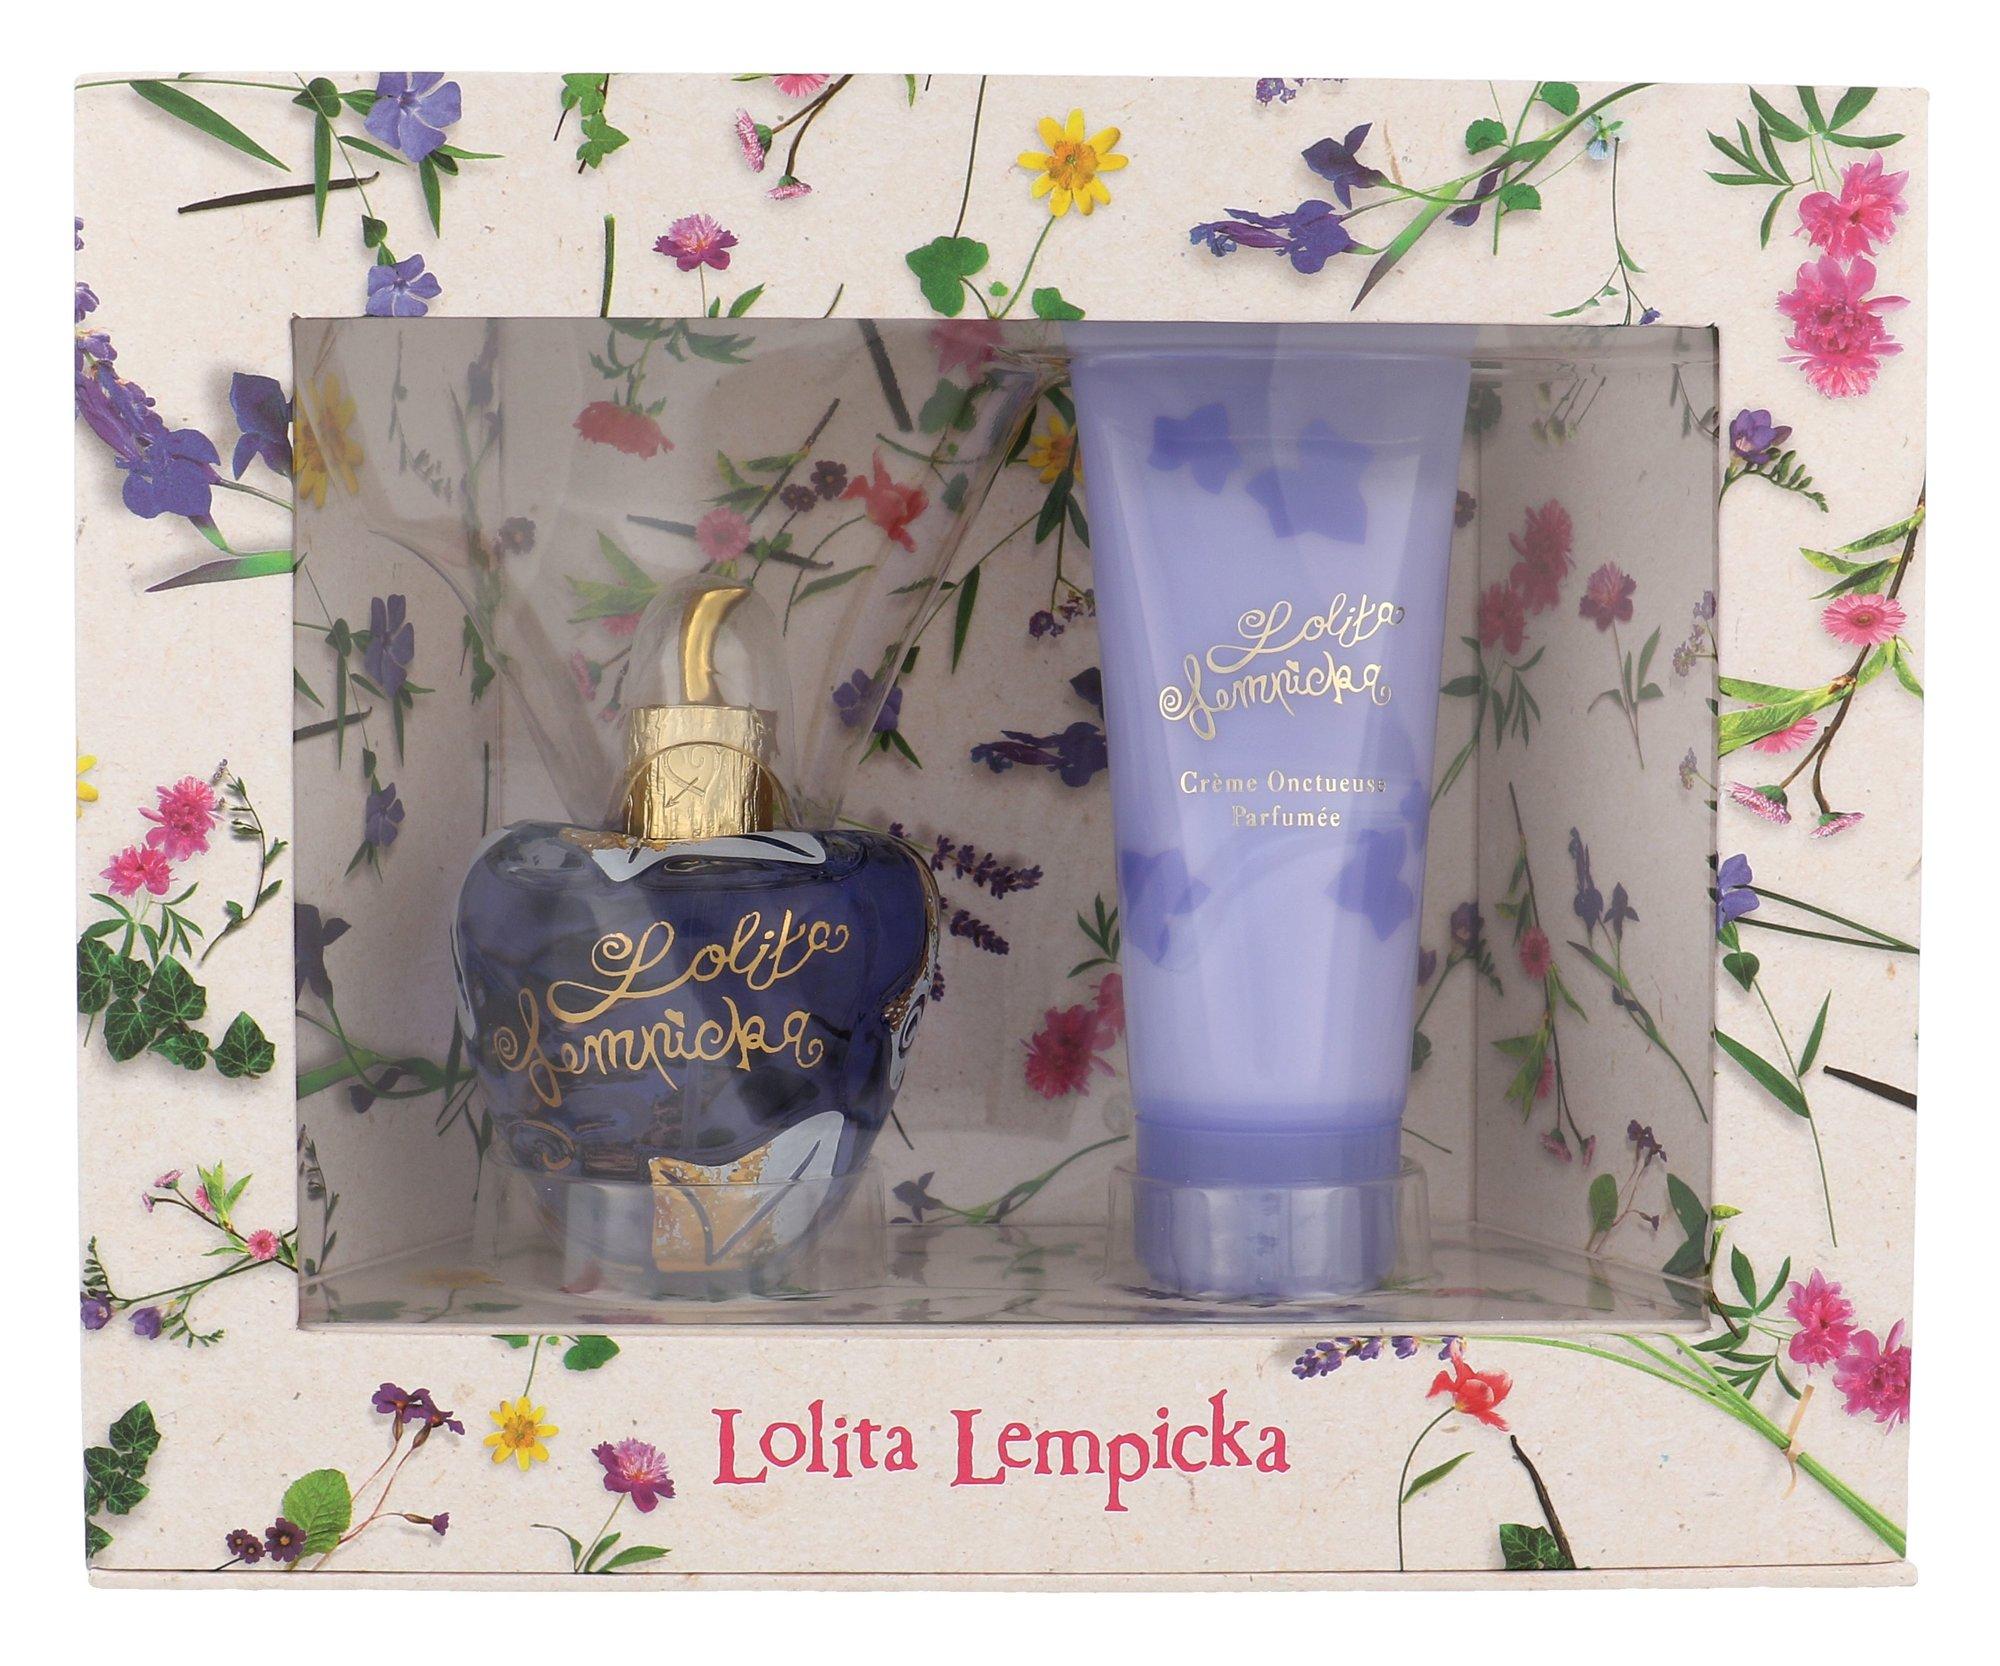 Lolita Lempicka Le Premier Parfum EDP 100ml